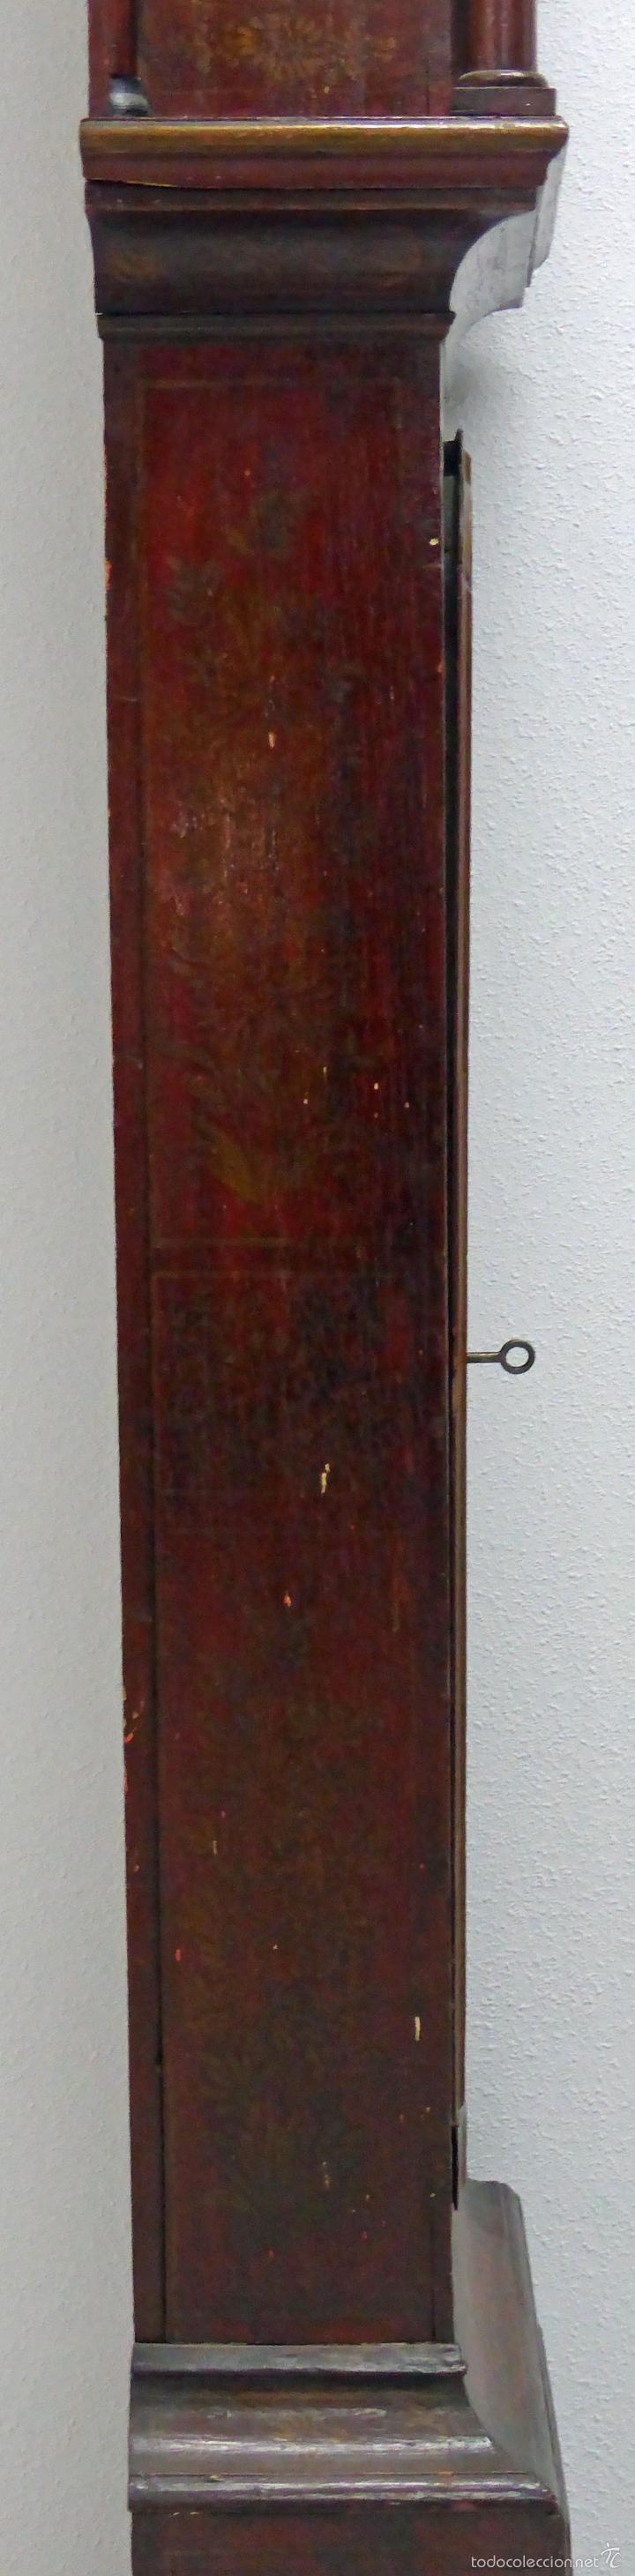 Relojes de pie: Reloj pie inglés laca japanning chinoseries S XVIII Maquinaria William Fidgett London Funciona - Foto 15 - 58294331